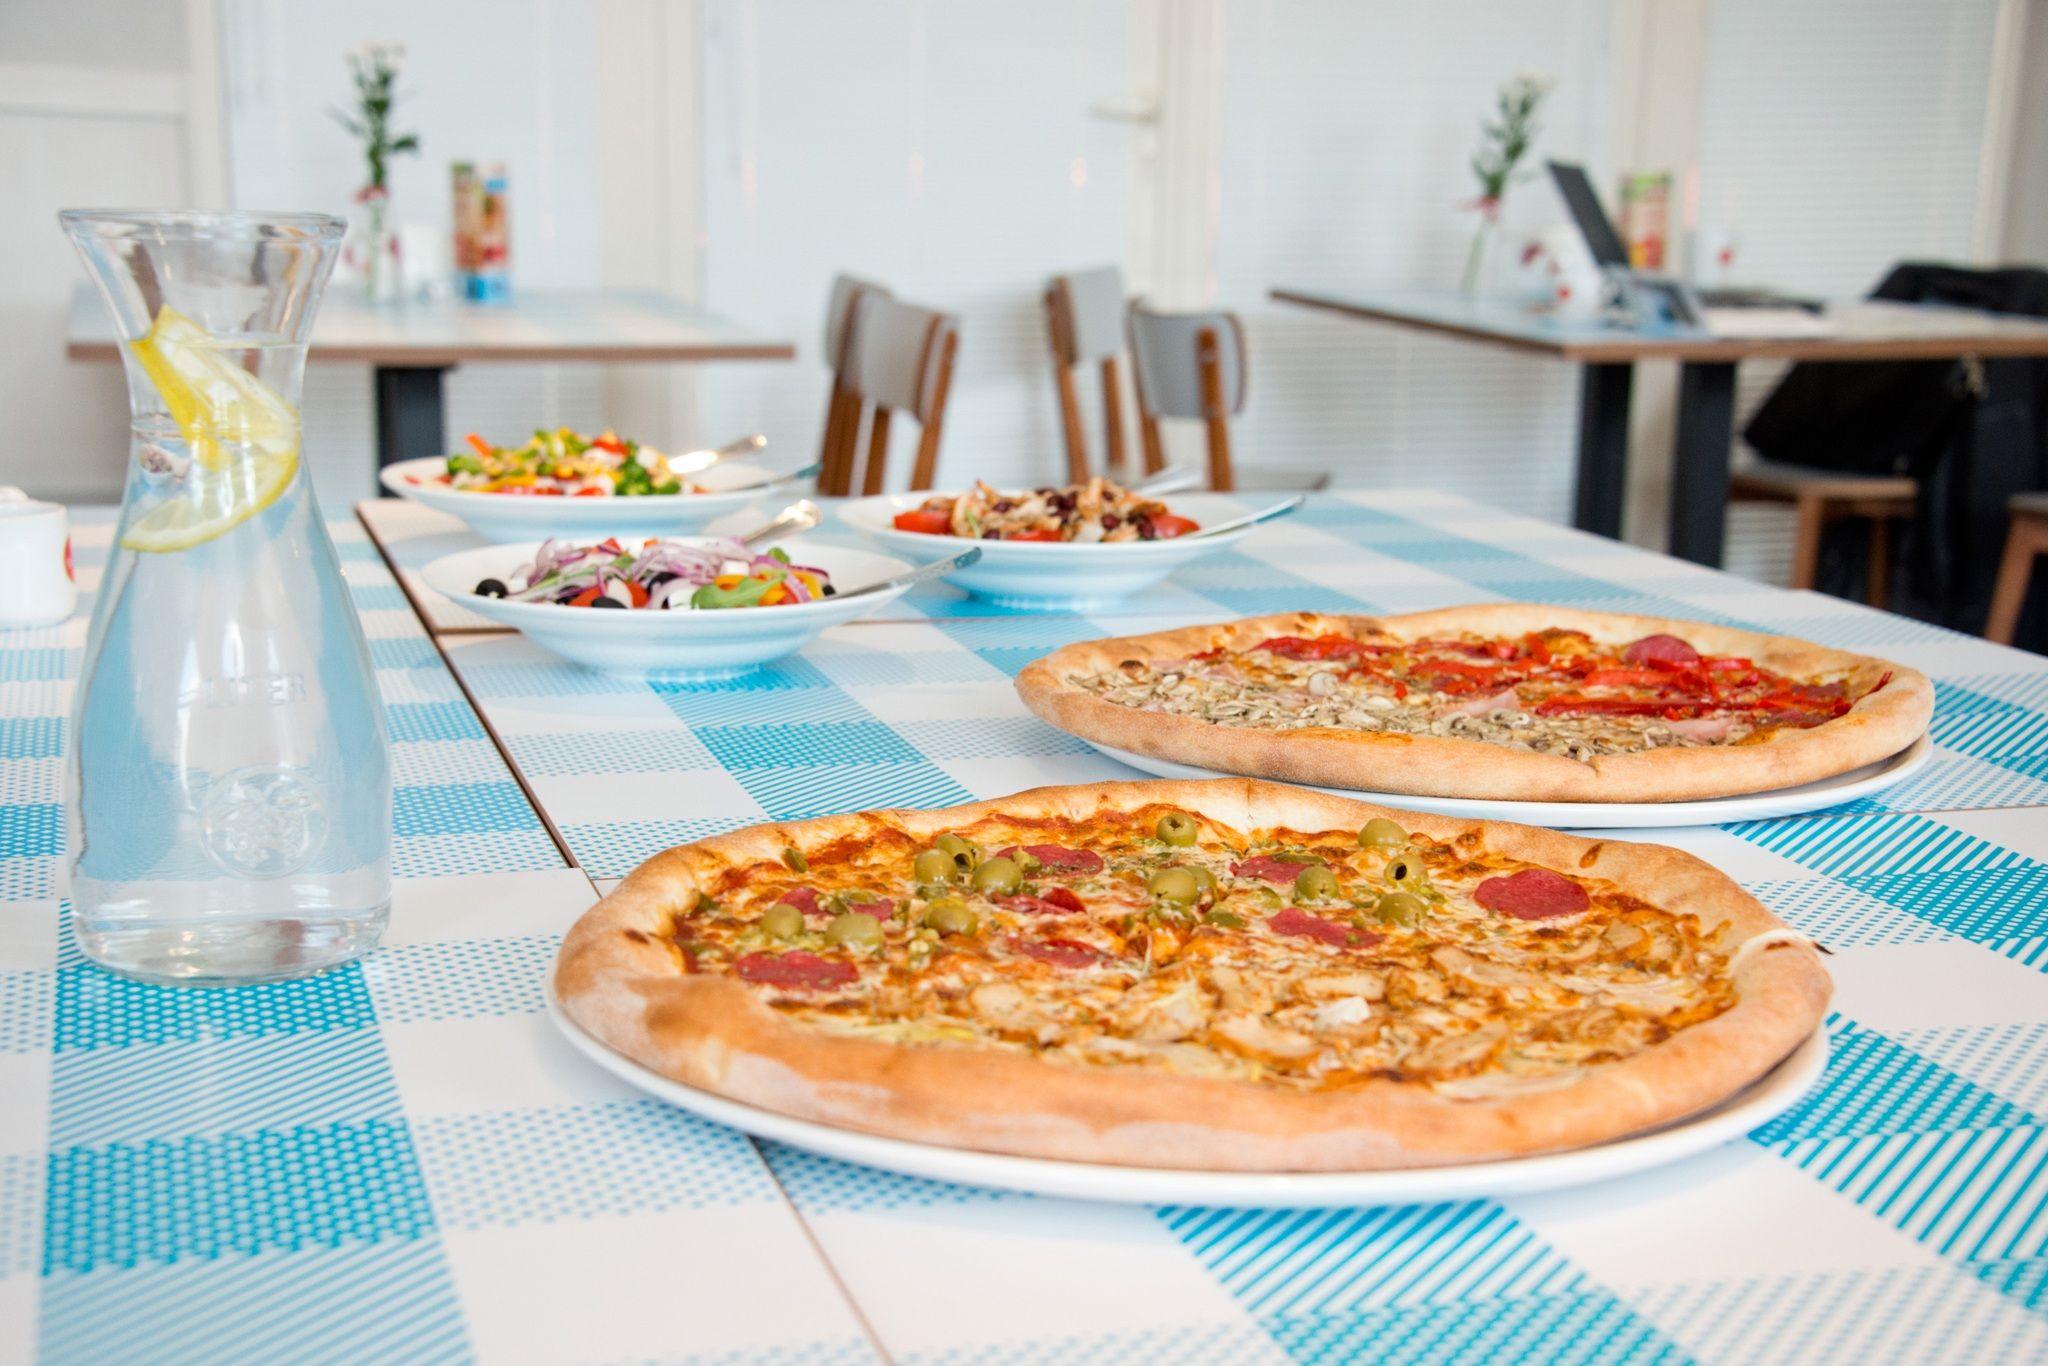 Having salami pizza in restaurant #recipes #food #cooking #delicious #foodie #foodrecipes #cook #recipe #health